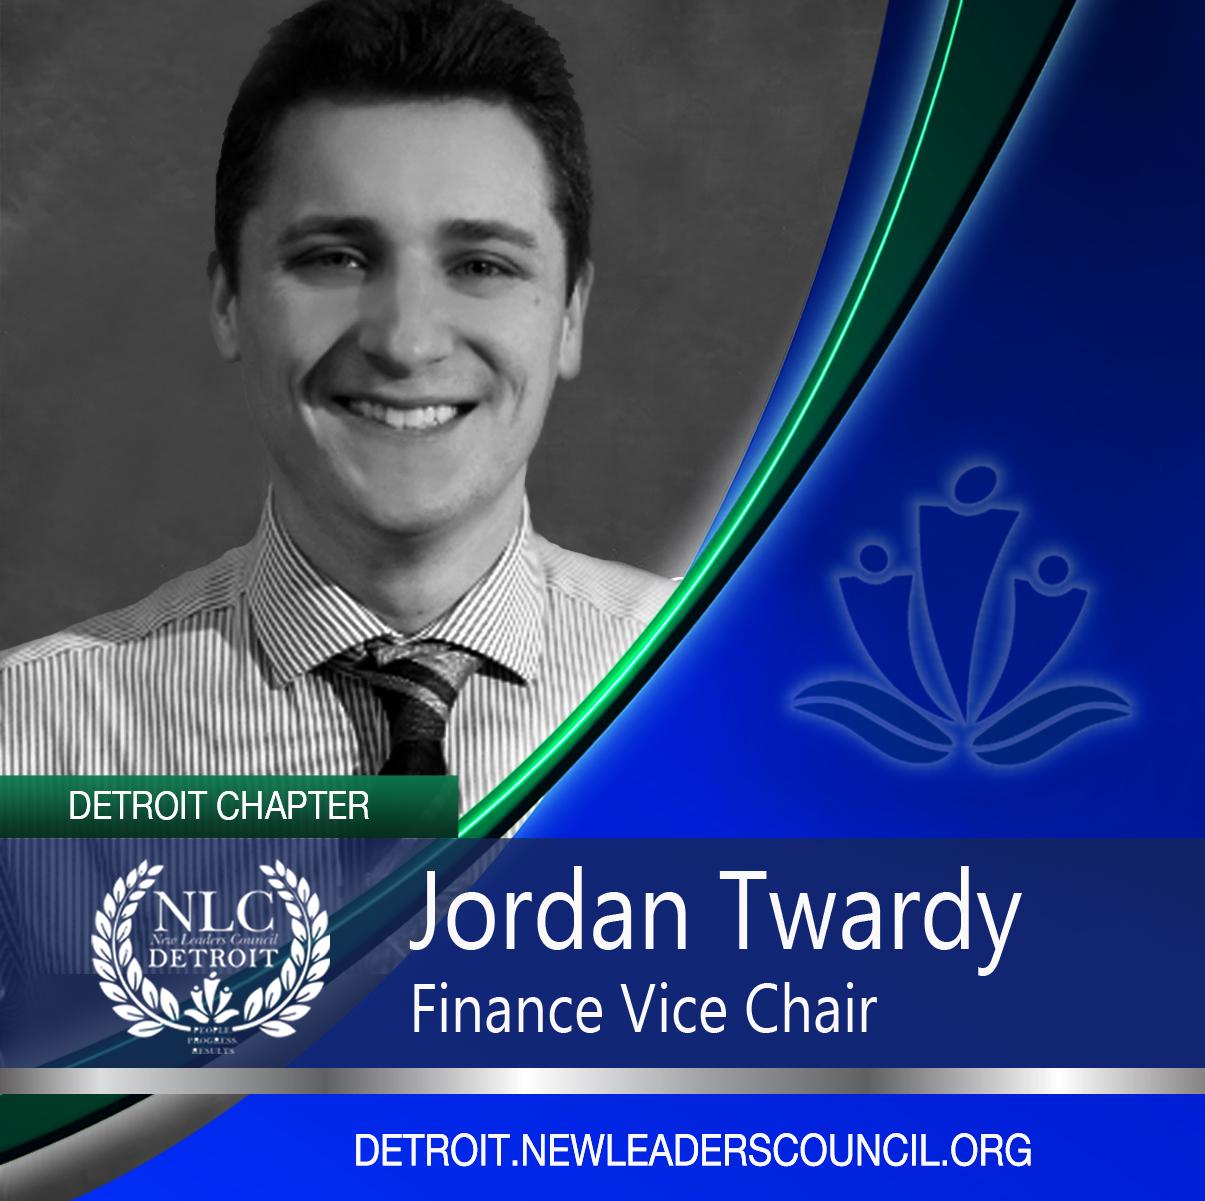 JordanTwardy_eBoard.jpg